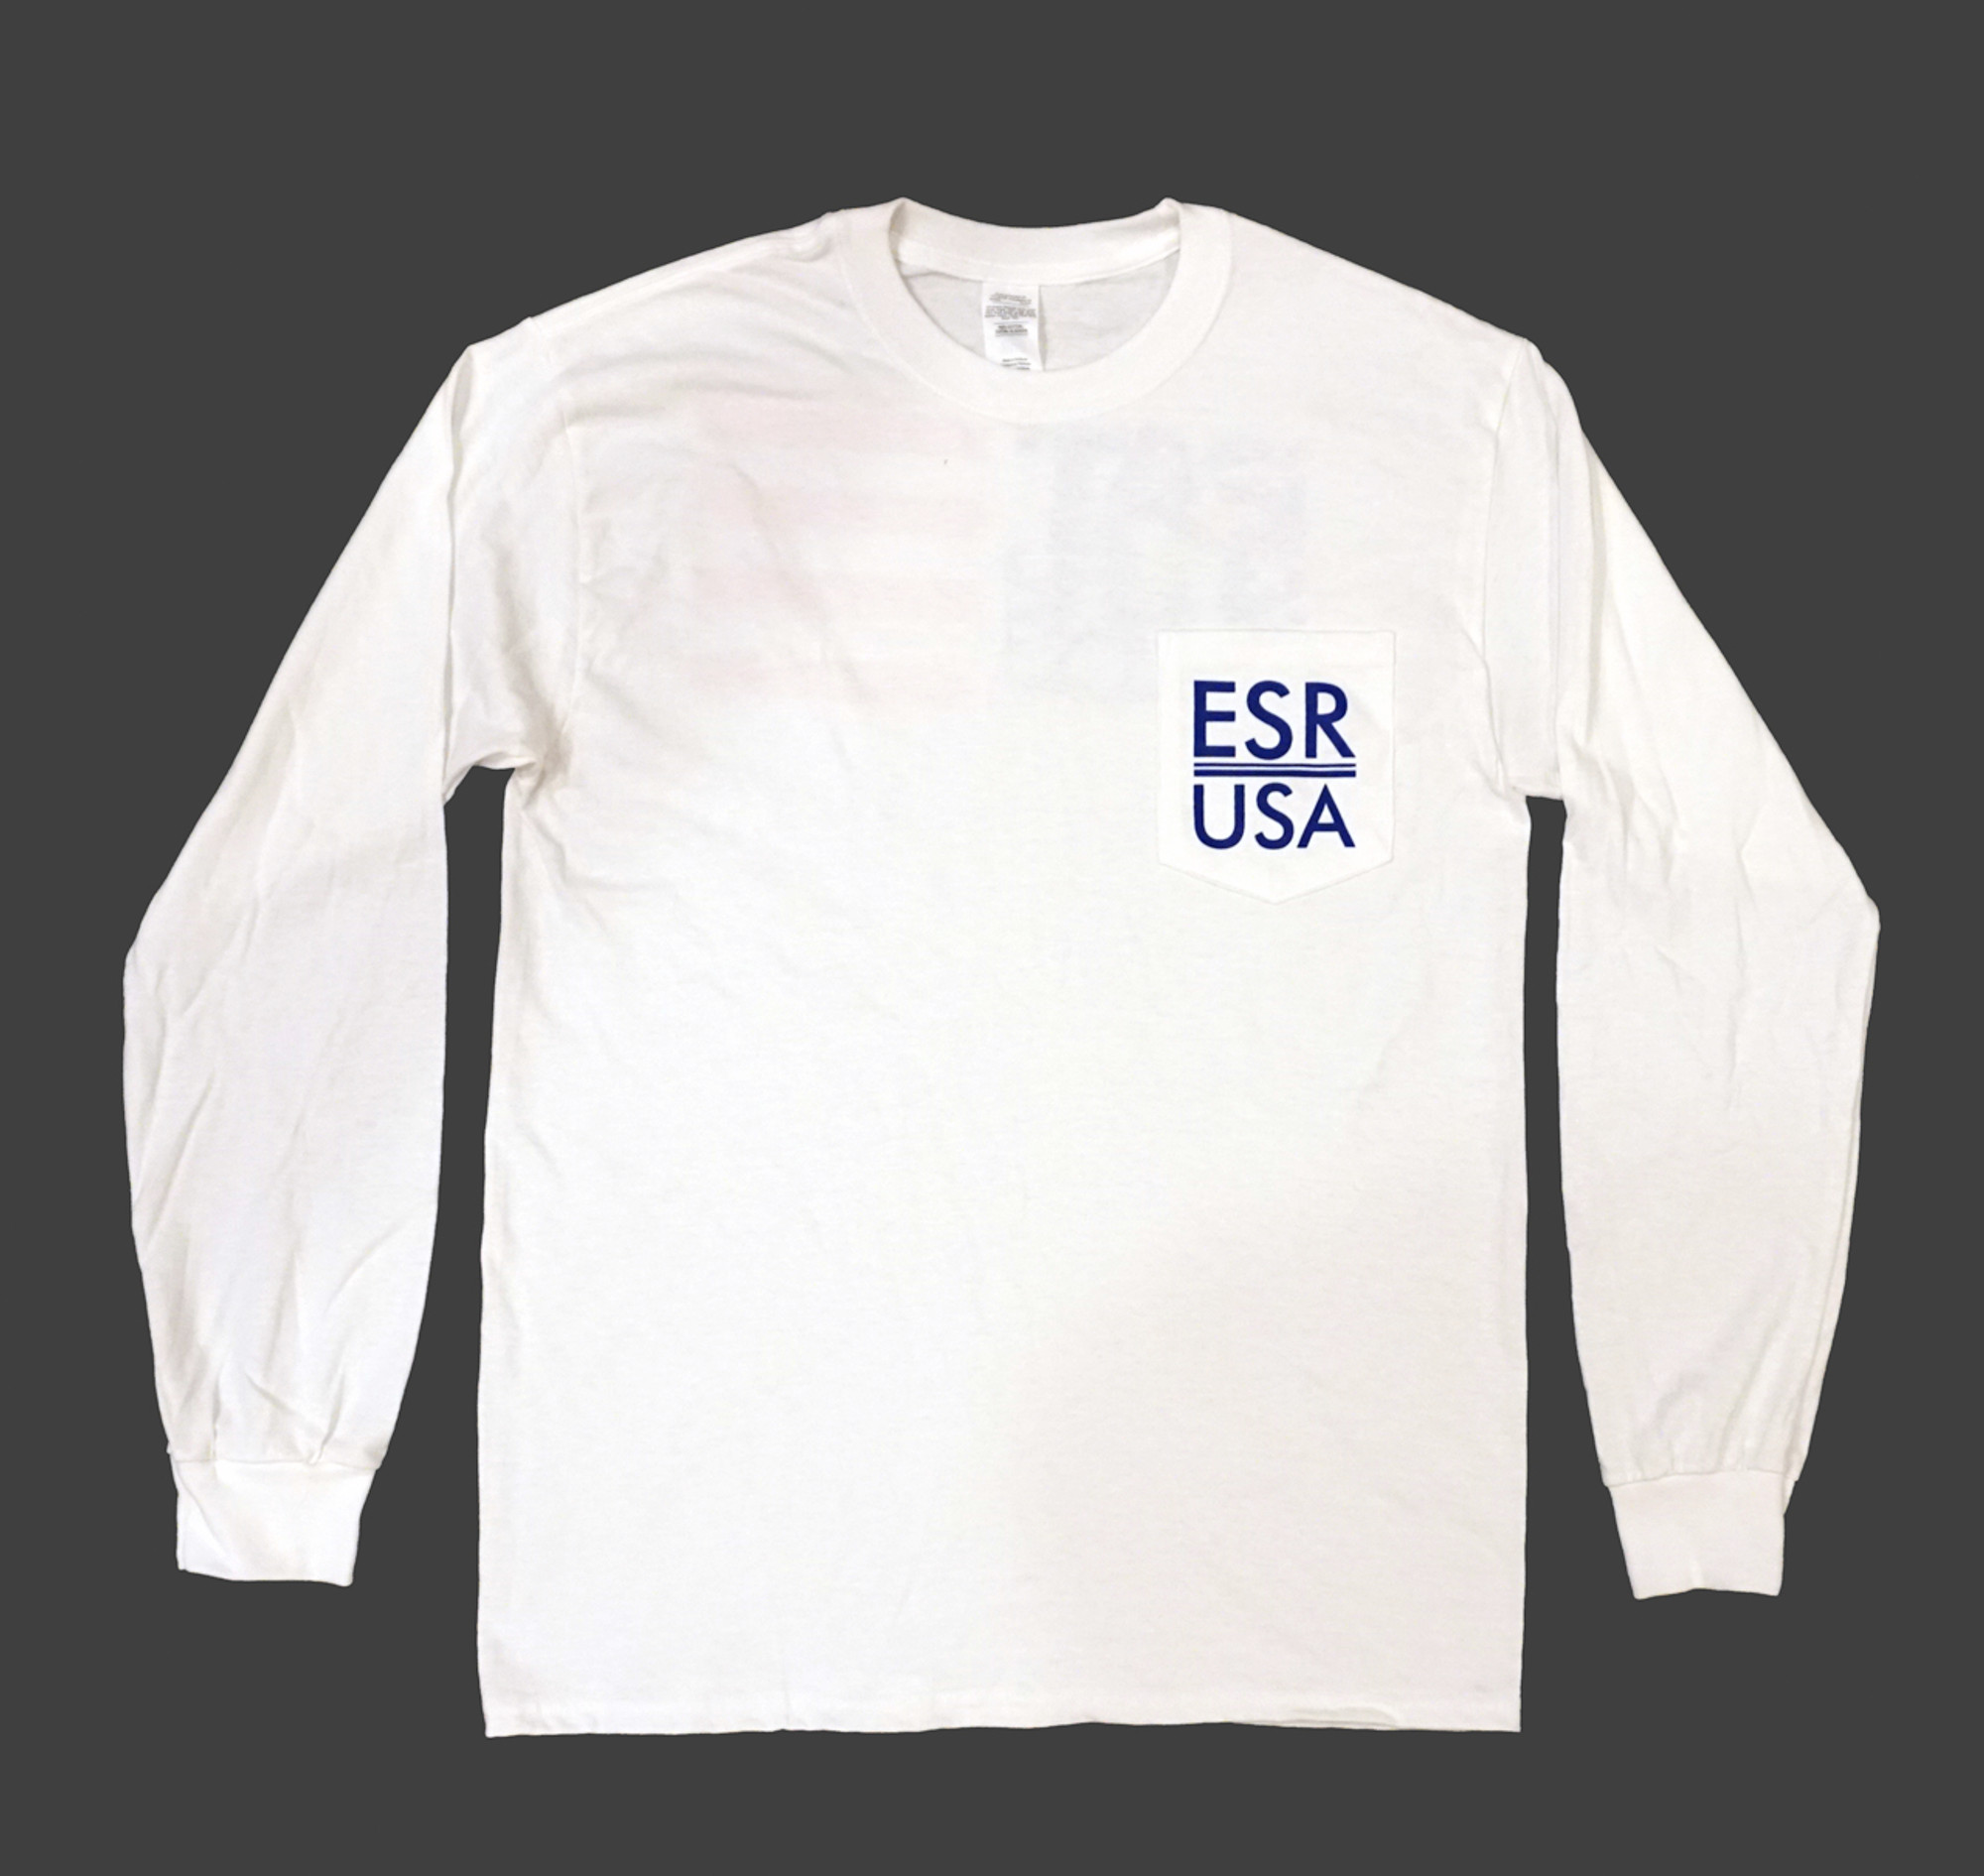 dd078f2c3a8 USA Pocket Long Sleeve Shirt